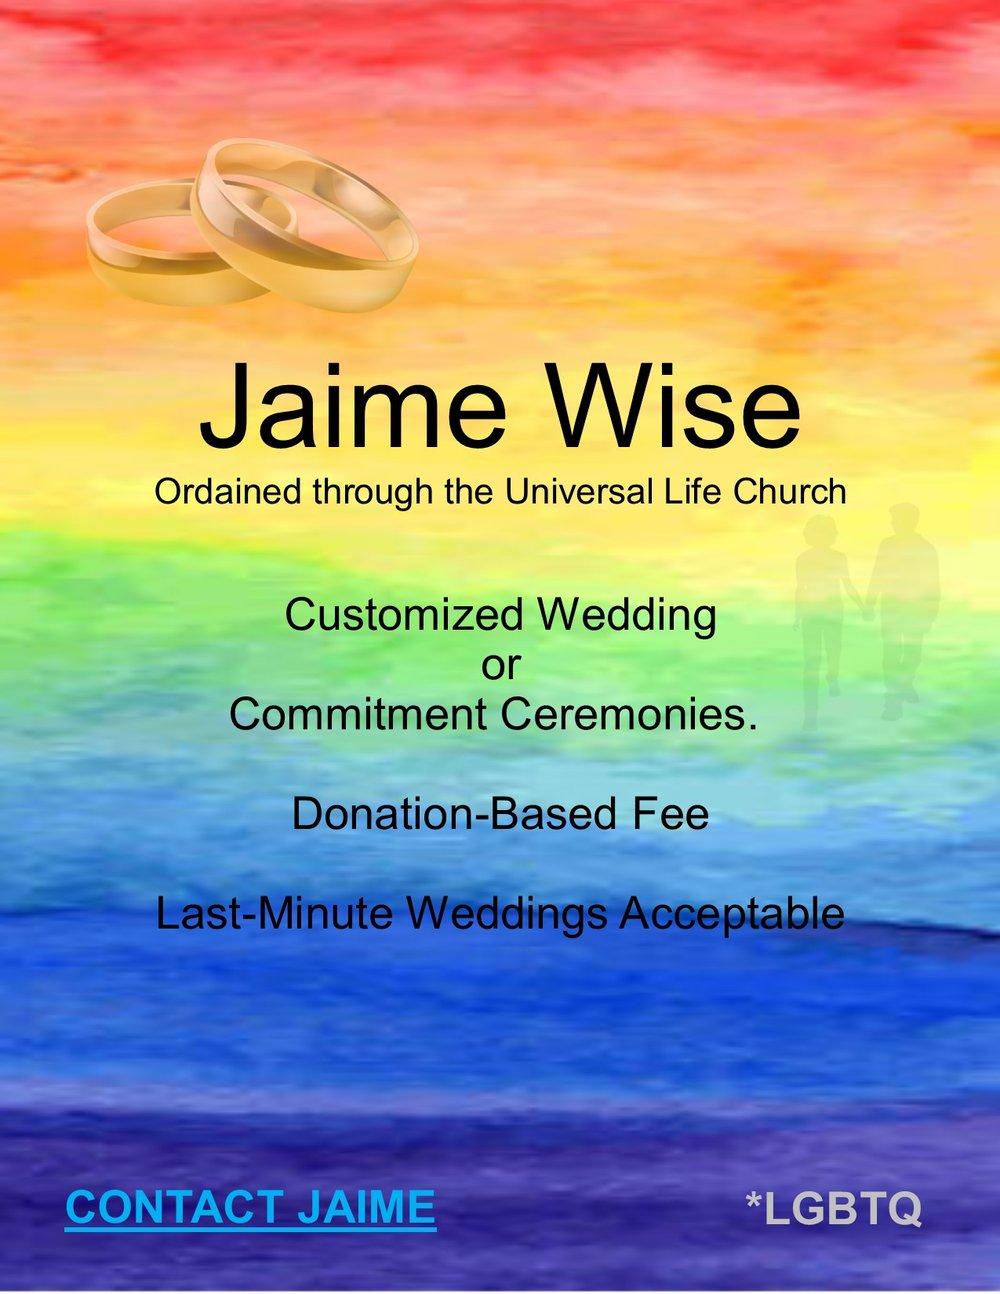 jaimewisessv@gmail.com